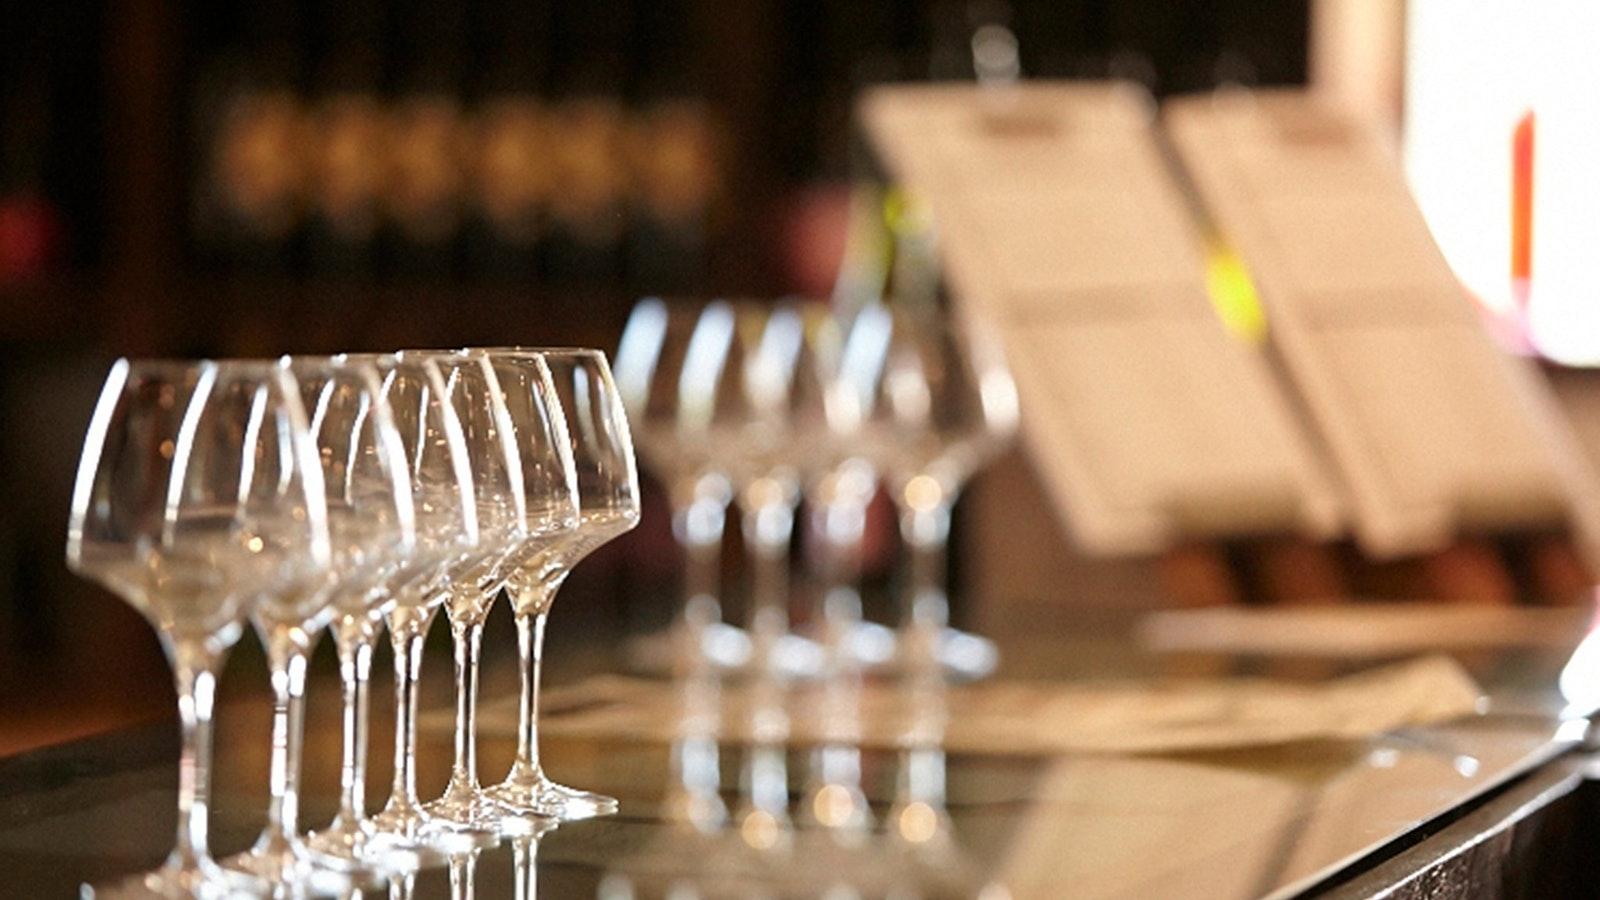 Sample of the best premium wines at T'Gallant Winery, Mornington Peninsula